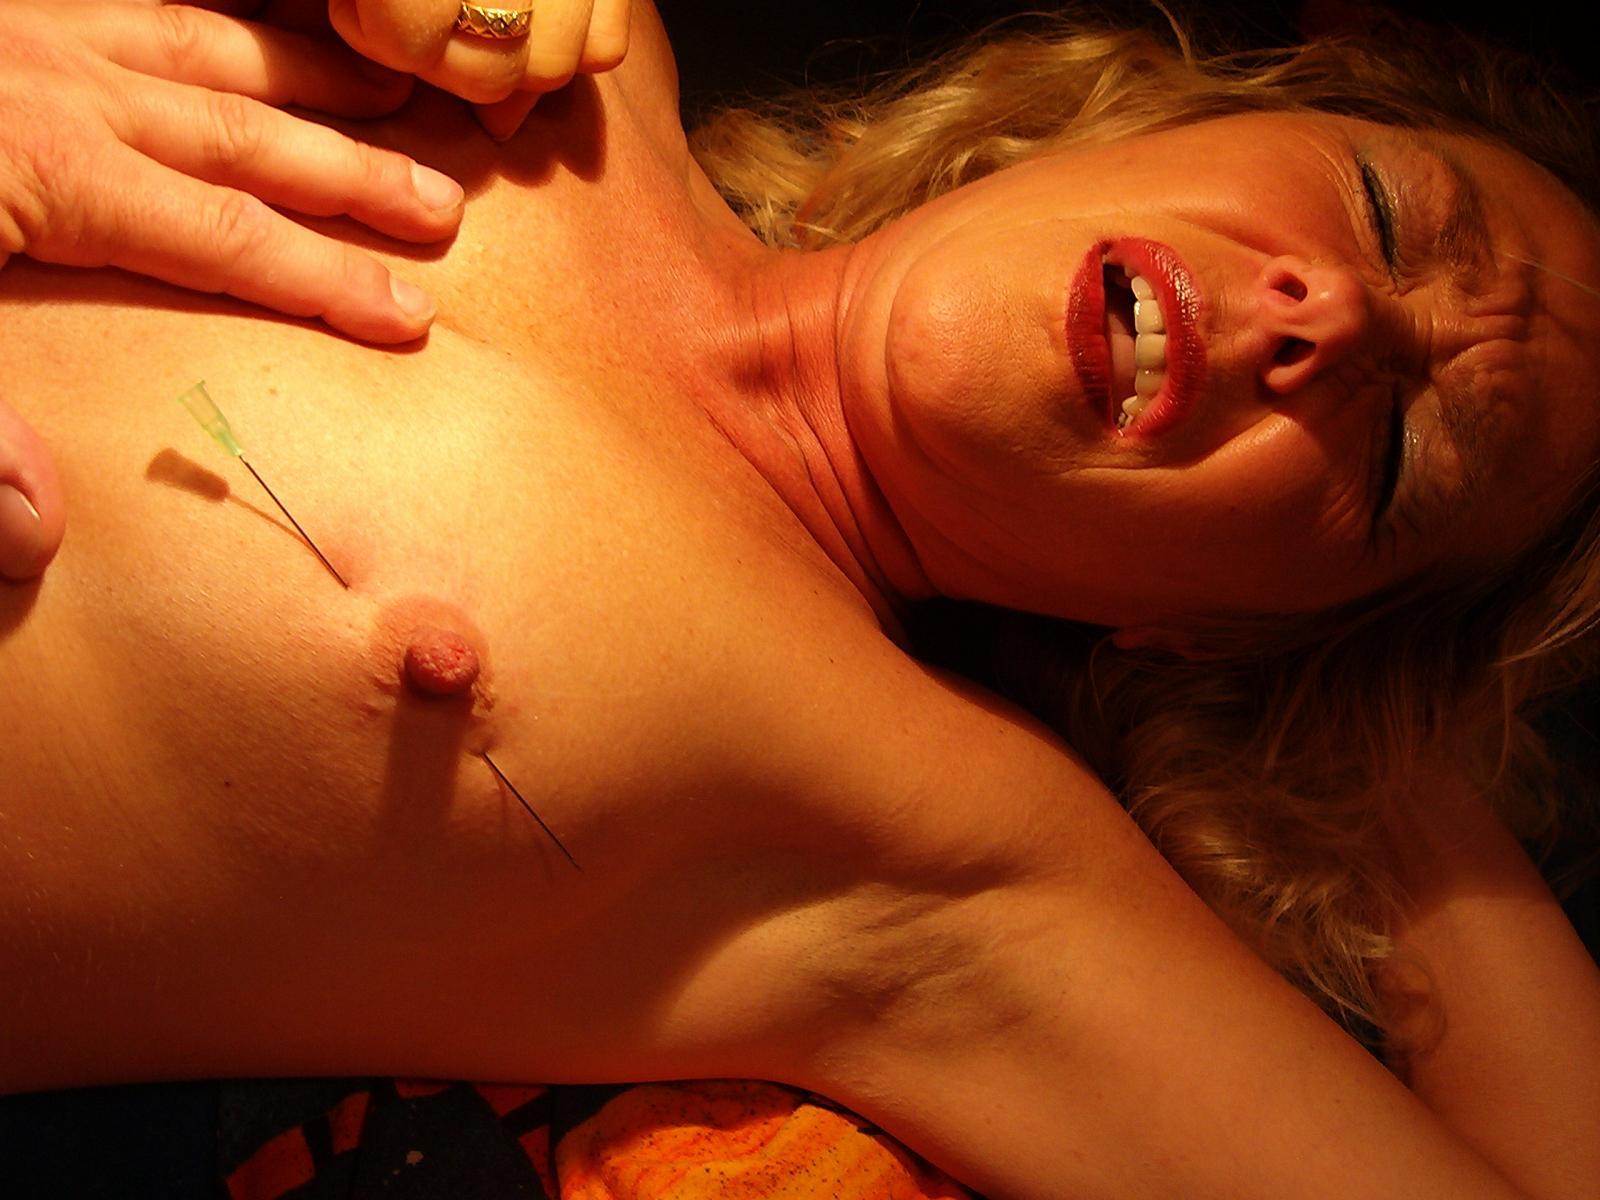 Torture needle vid tit